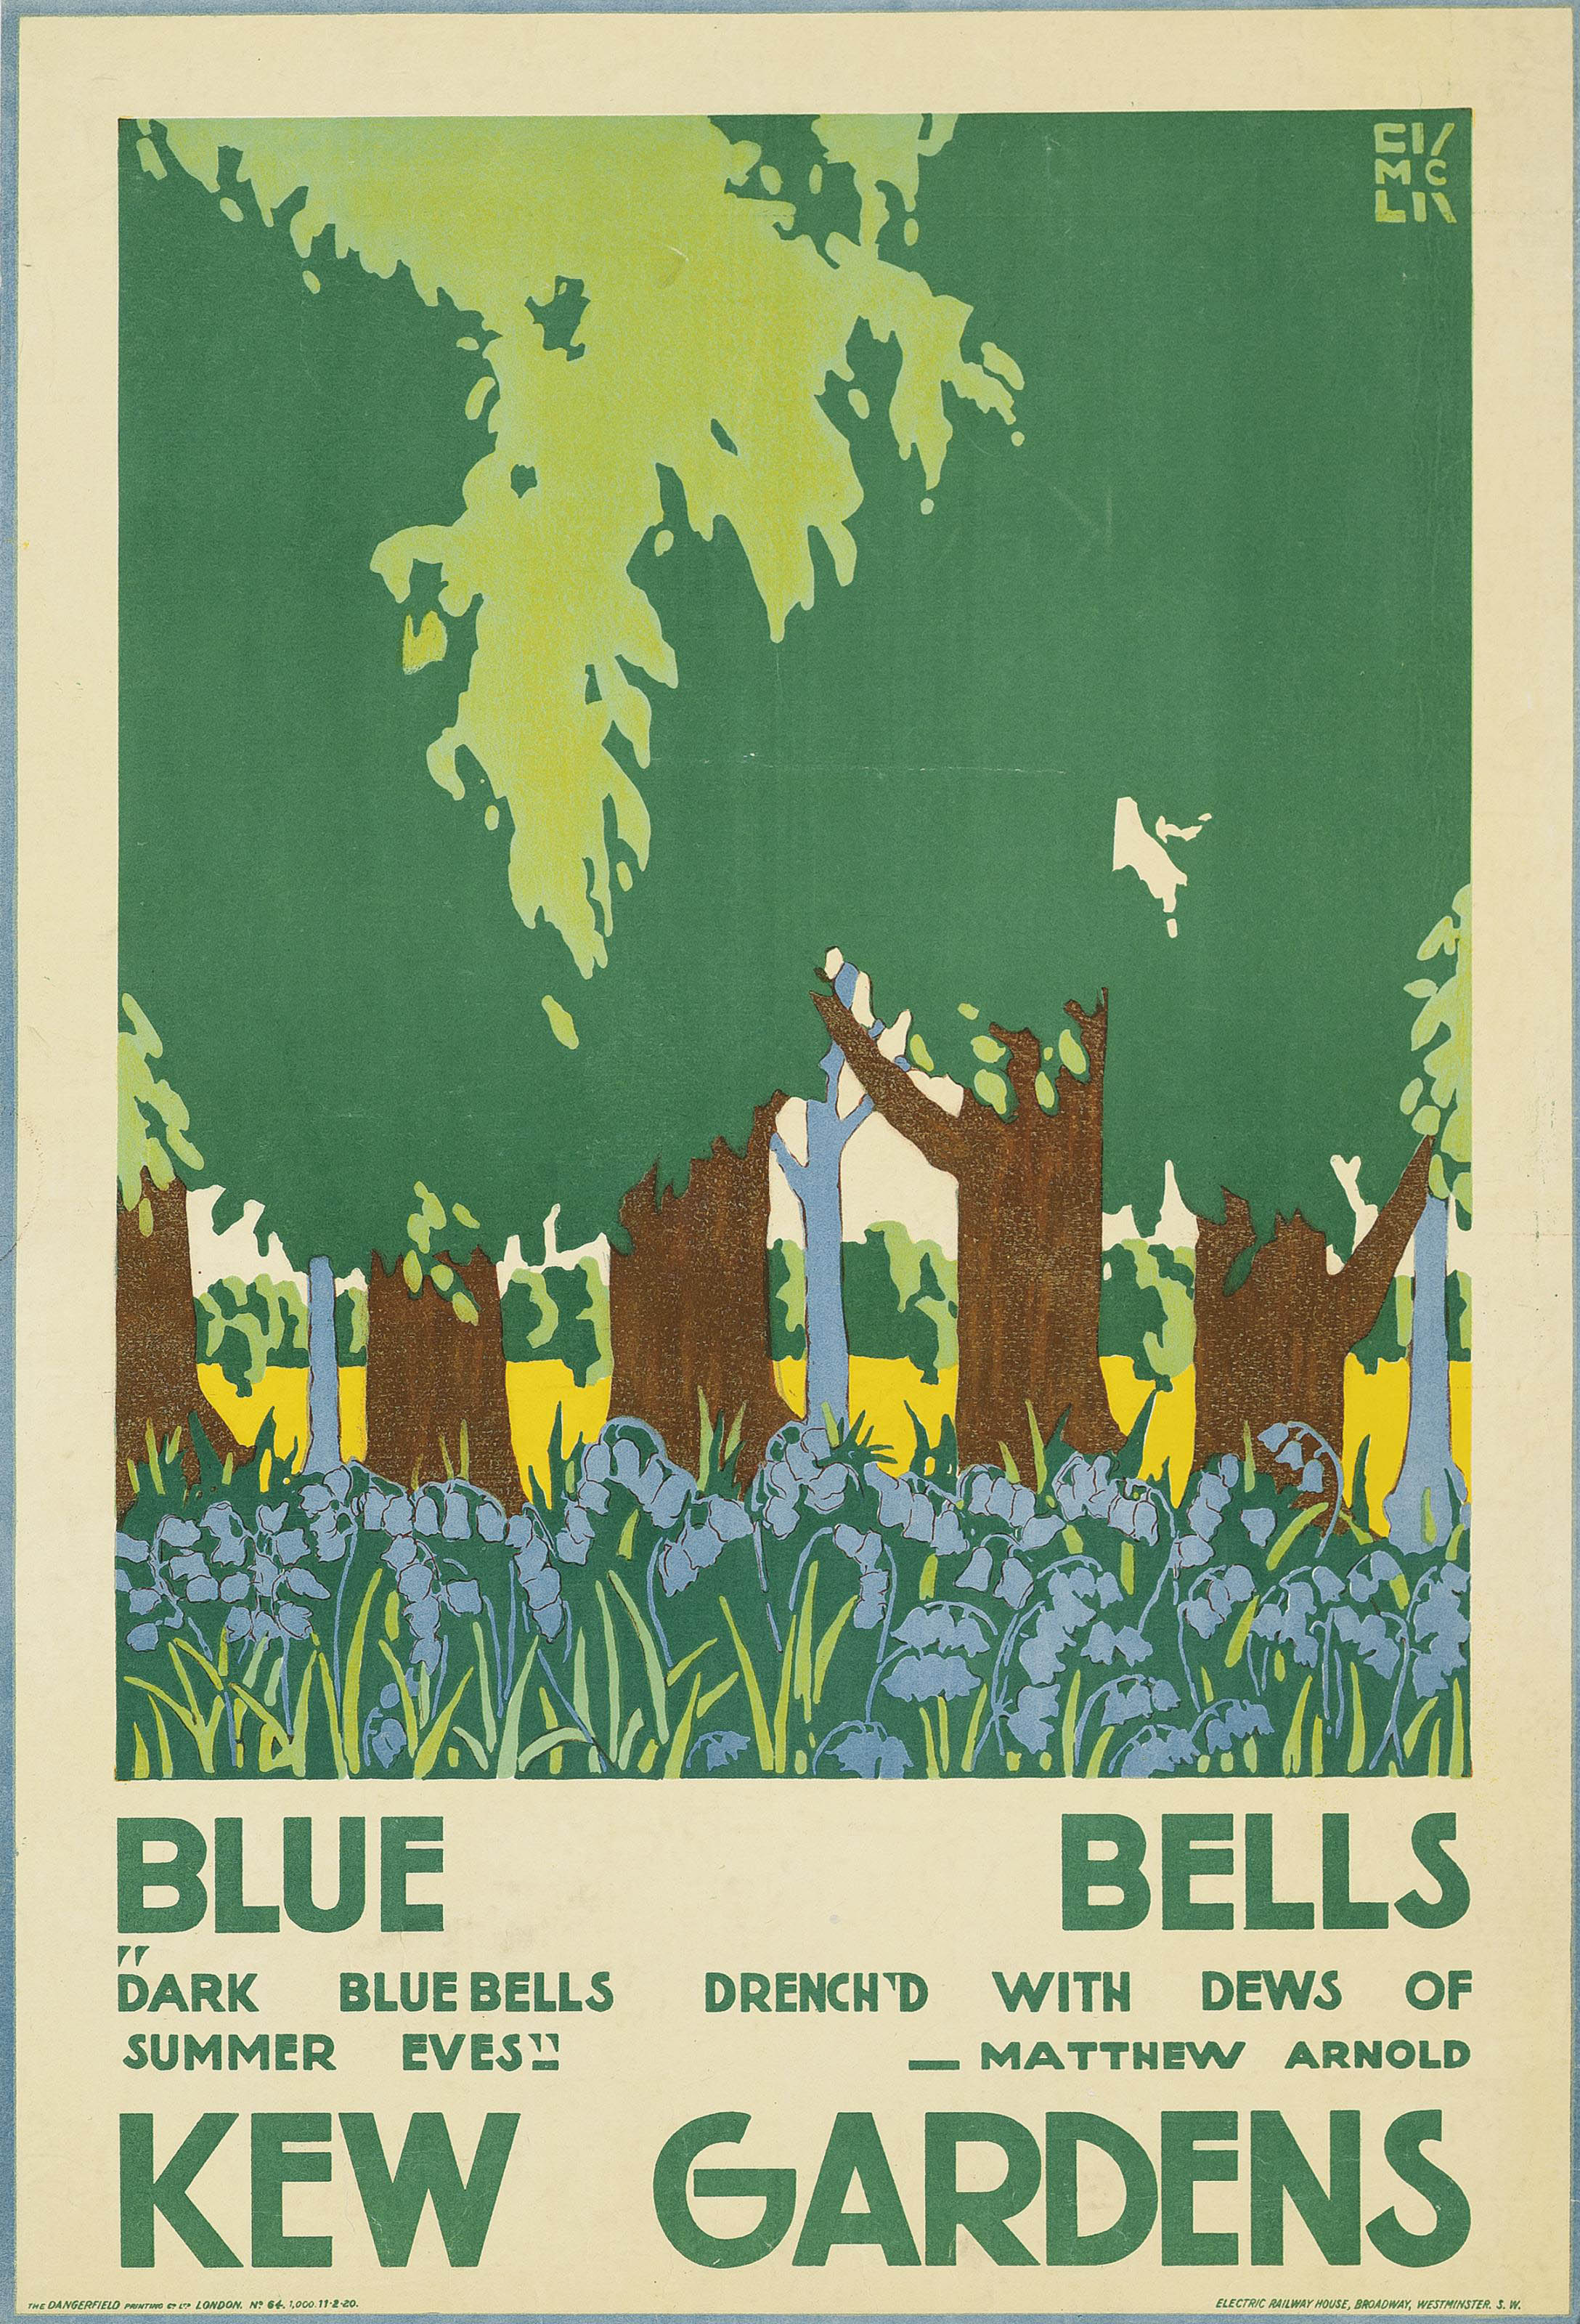 Kew Gardens Phone No: Edward McKnight Kauffer (1890-1954) , BLUEBELLS, KEW